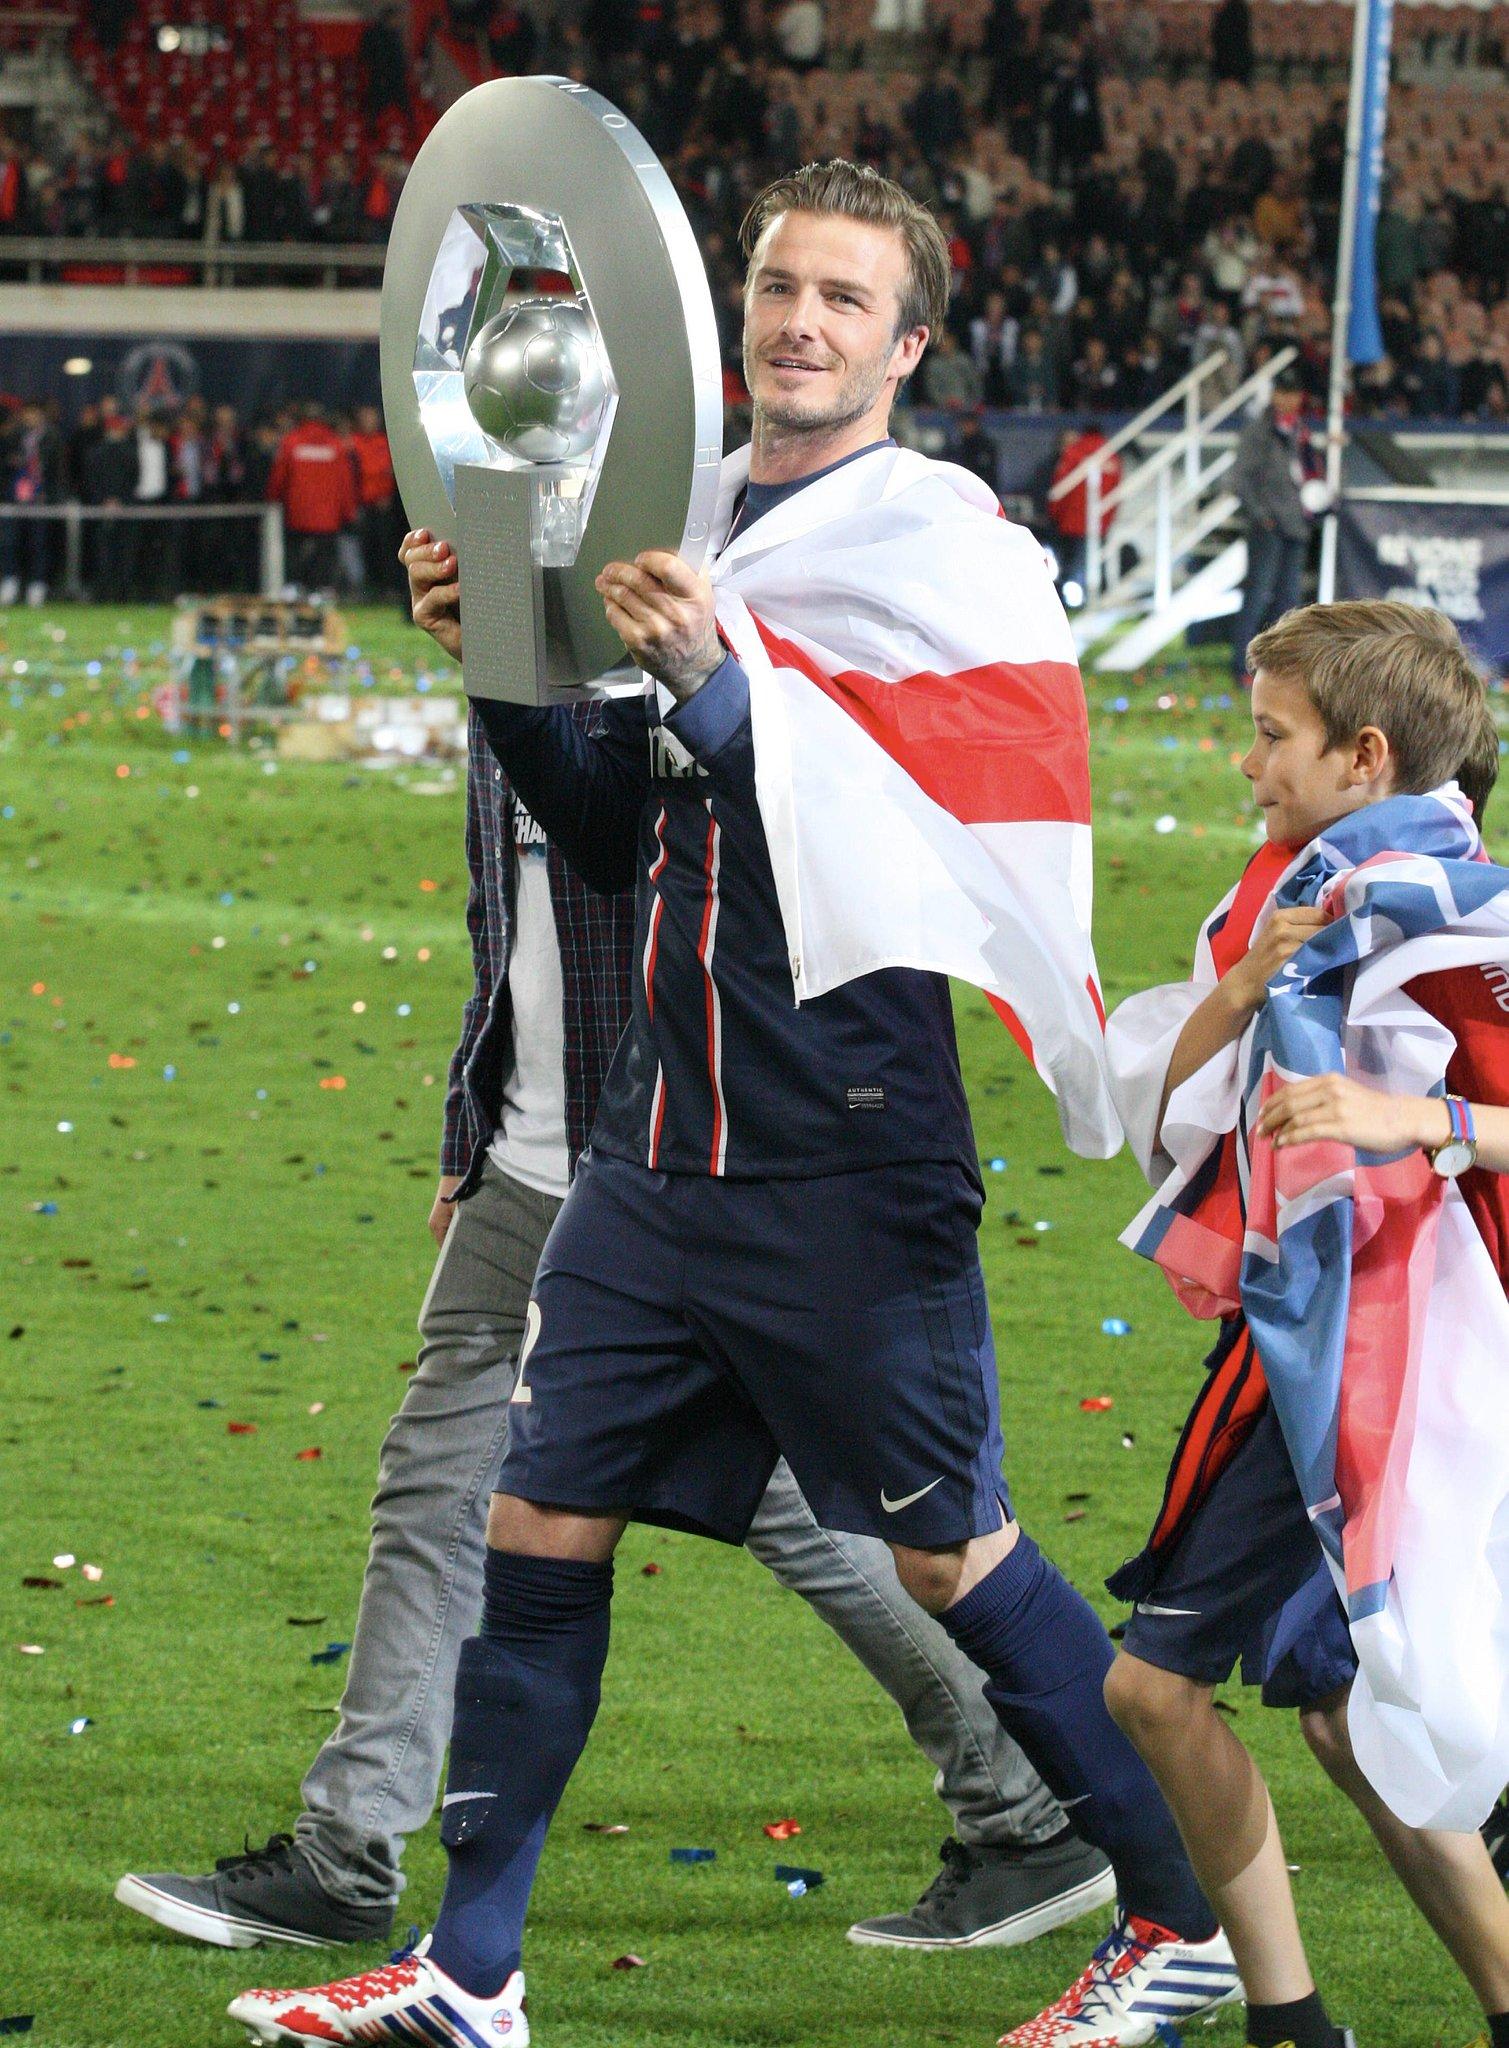 See David Beckham's Emotional Final Home Game!